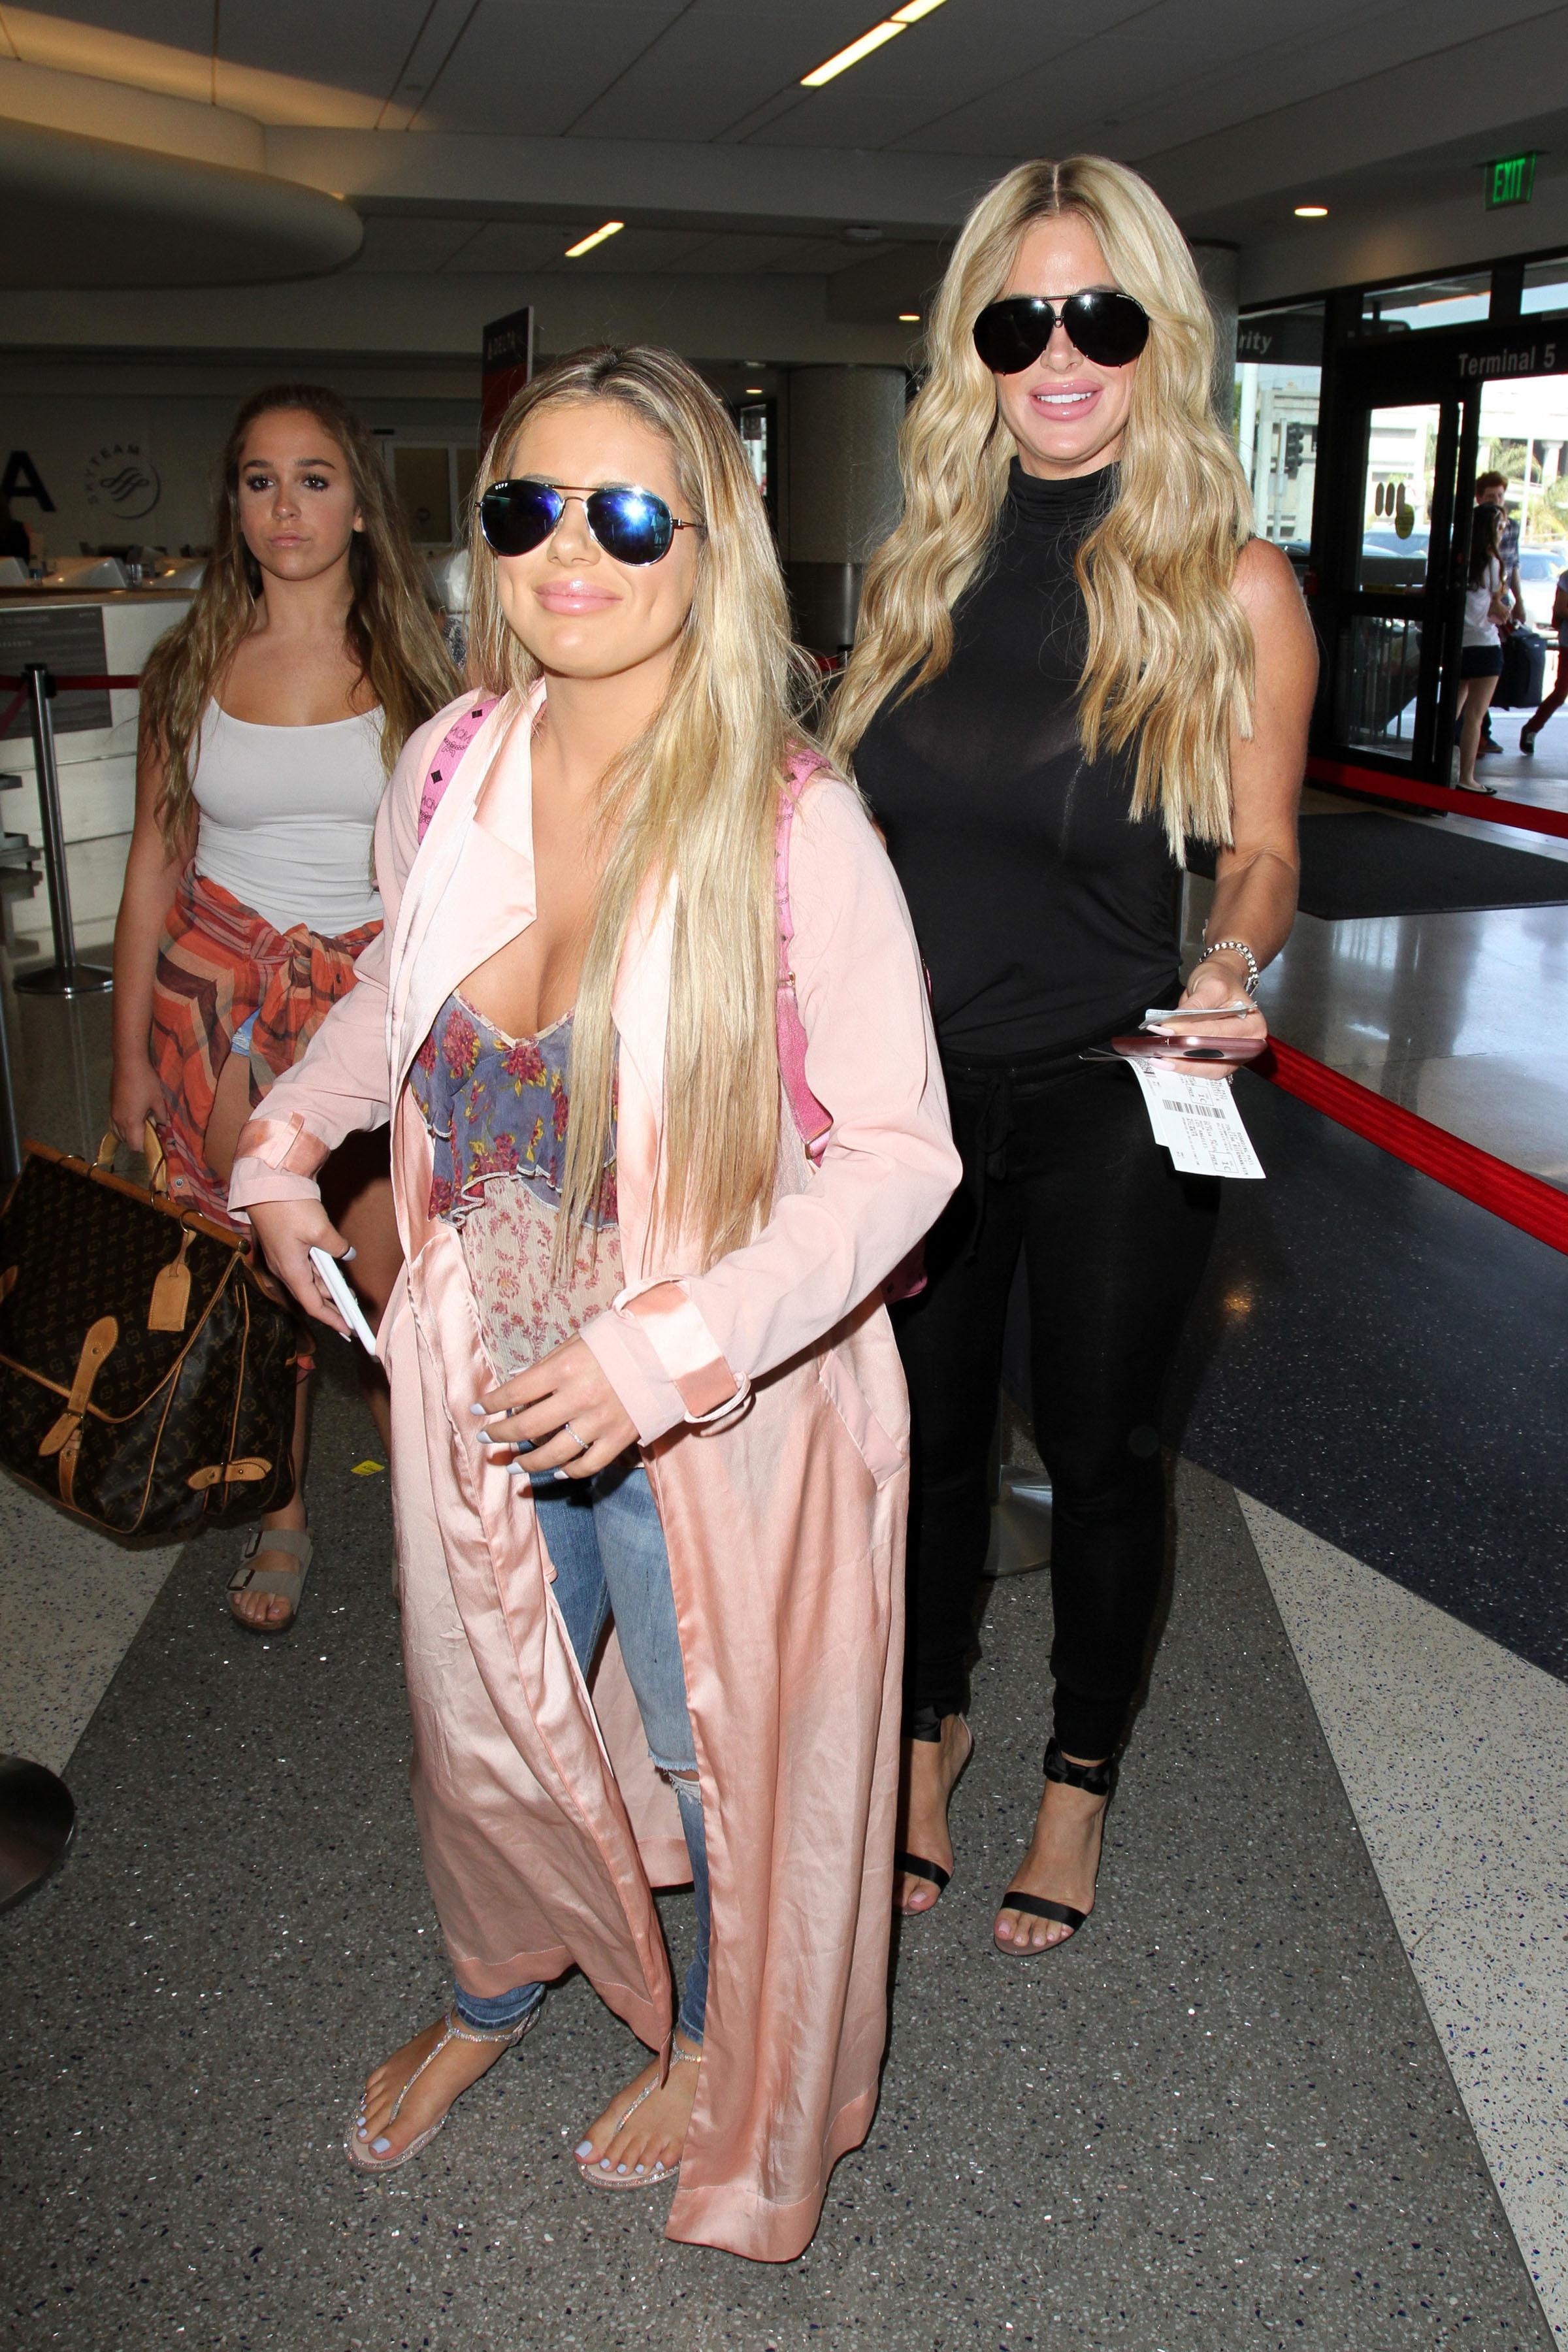 Kim Zolciak dismisses rumors she'll return to 'RHOA'